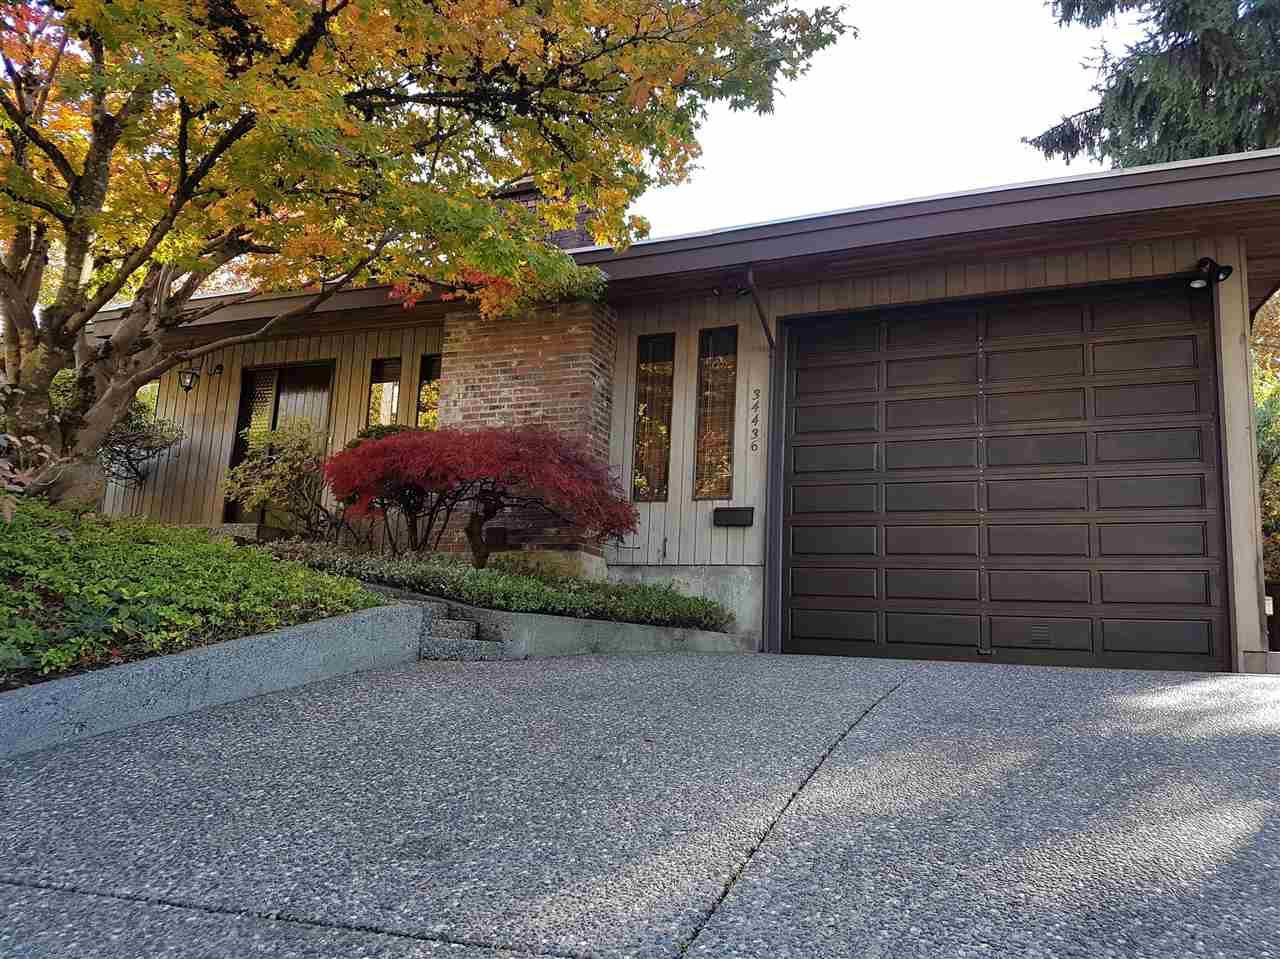 Main Photo: 34436 LABURNUM AVENUE in : Abbotsford East House for sale : MLS®# R2229203